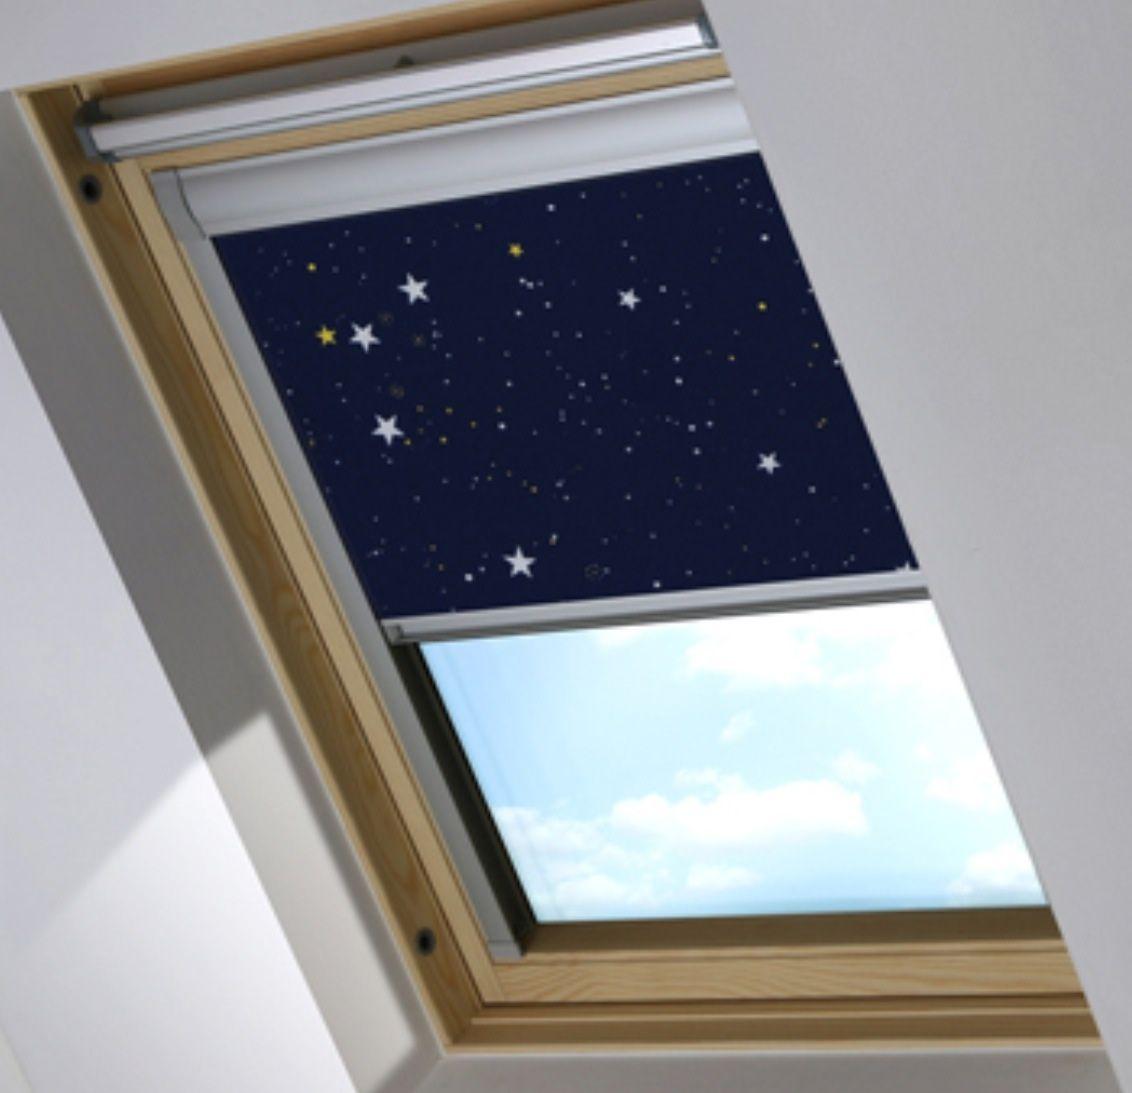 Bloc blinds skylight blackout blind in night sky